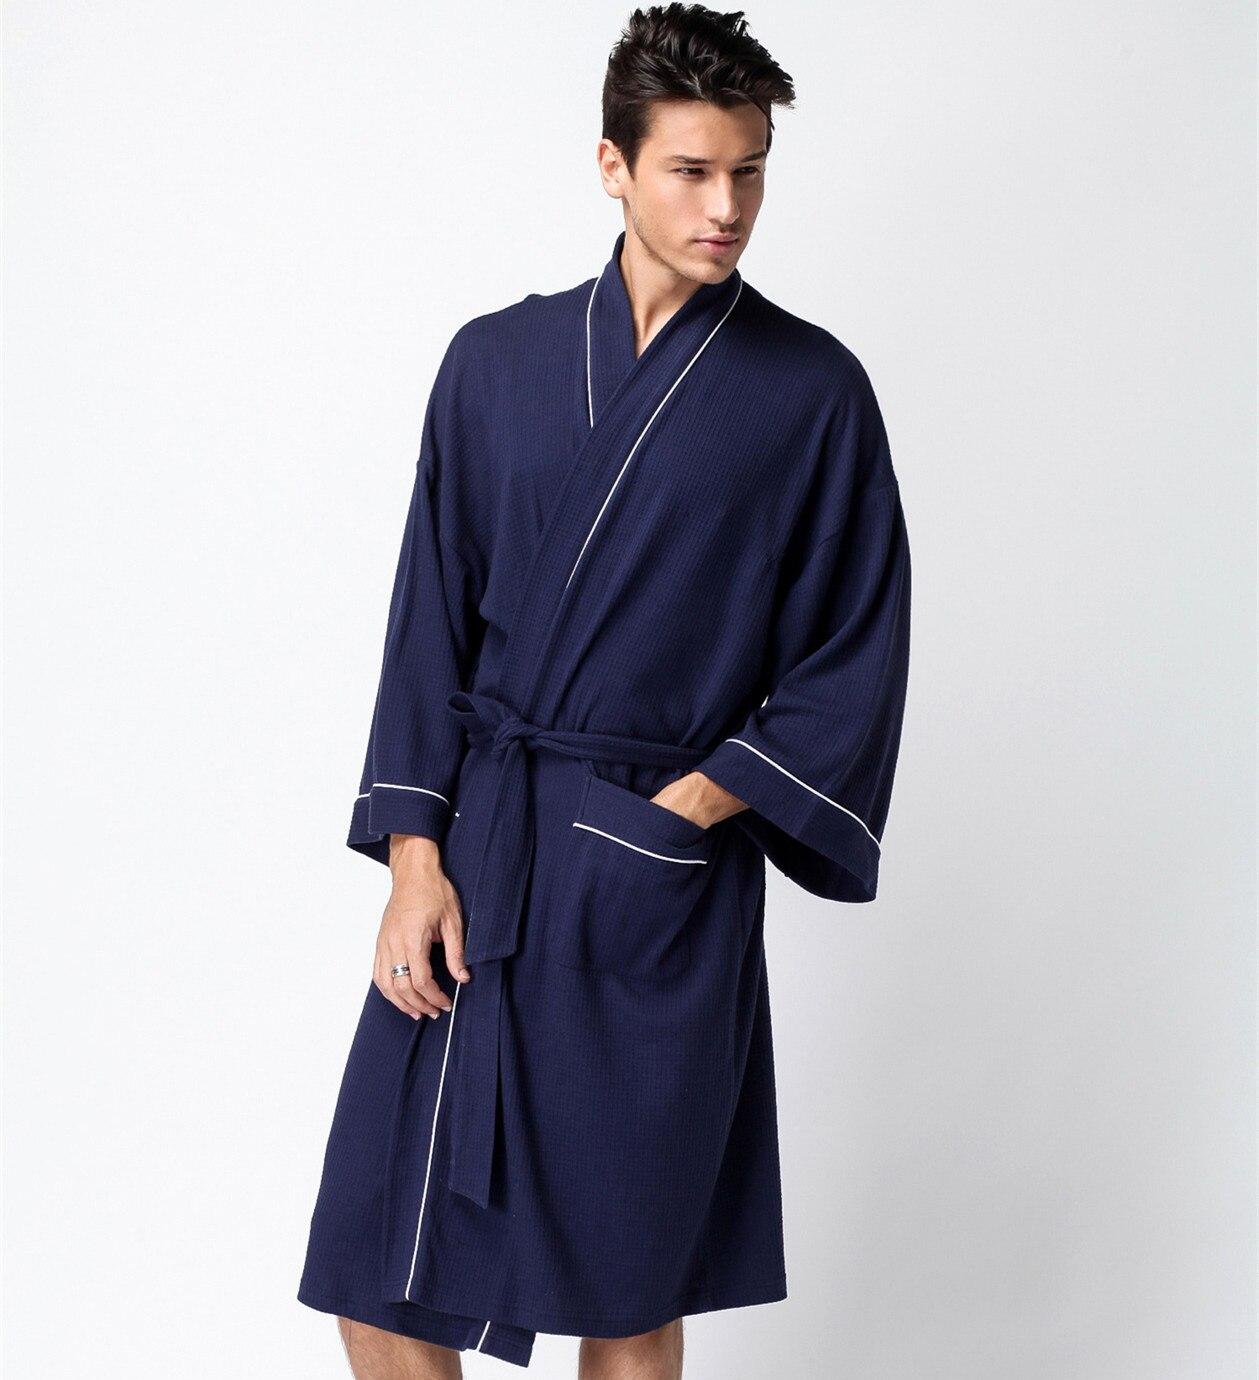 Summer Men's Waffle Bathrobe Soft Cotton Thin Sleepwear Bathrobe Hotel SPA Robe Towel Lovers Long-sleeve Lounge Dressing Gown